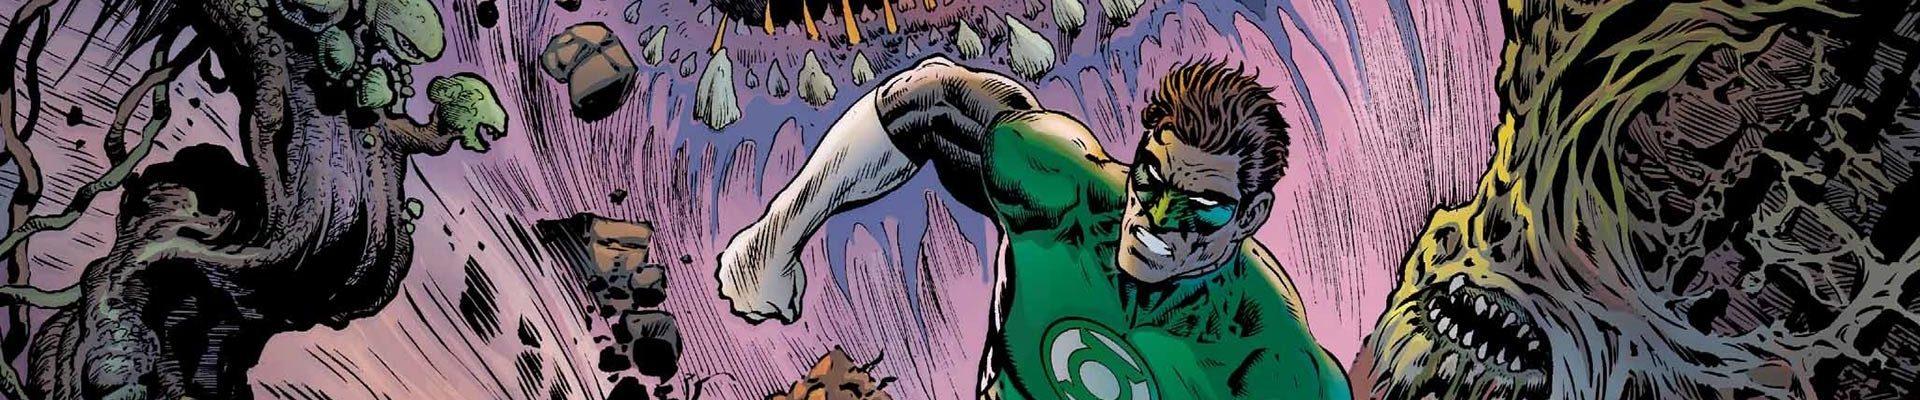 Green Lantern 5